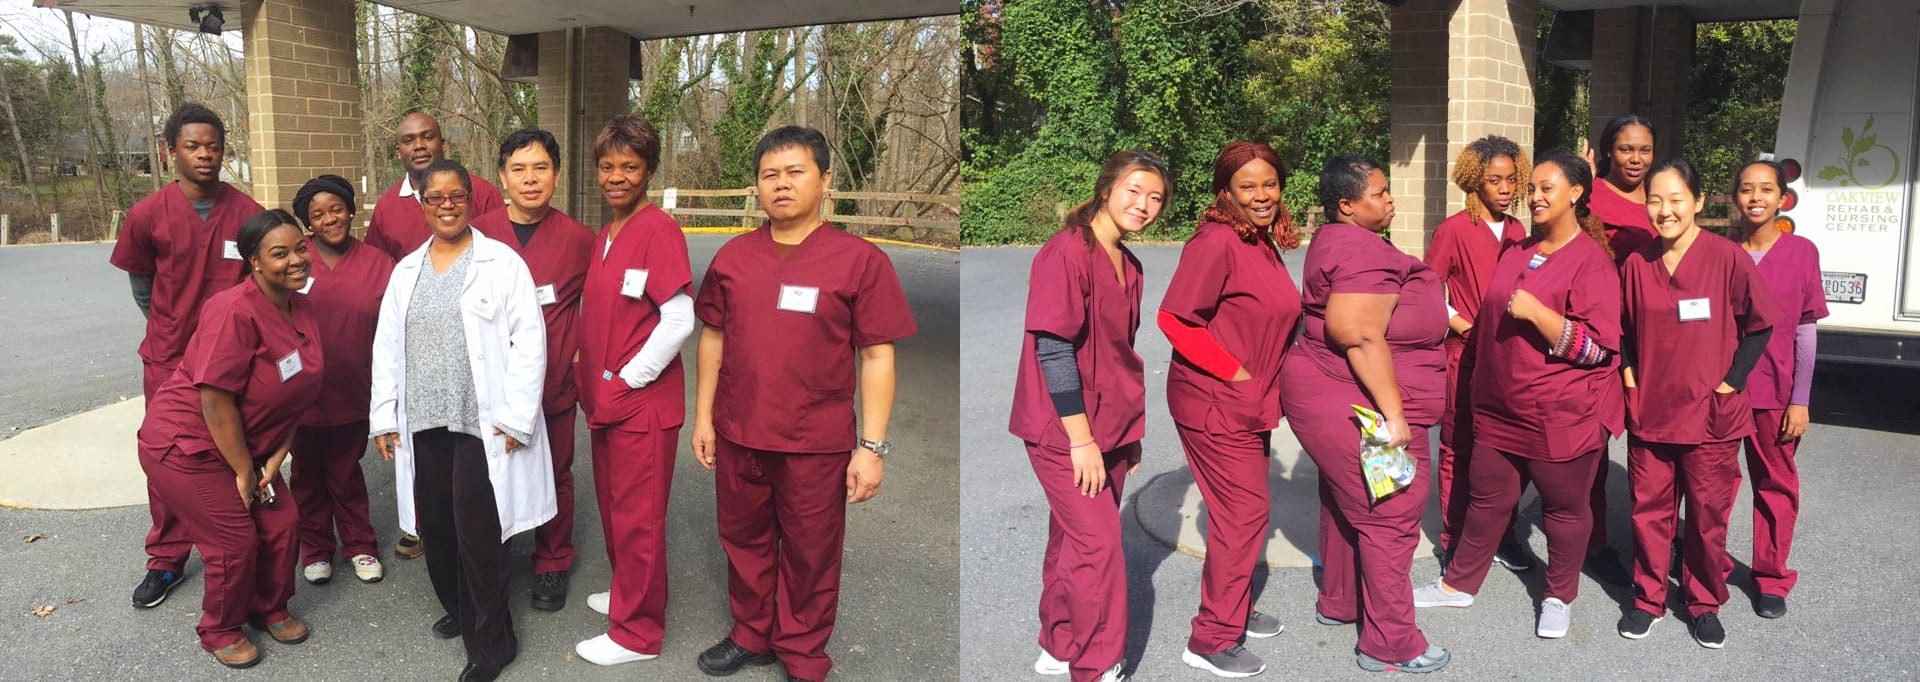 Healthcare staffs